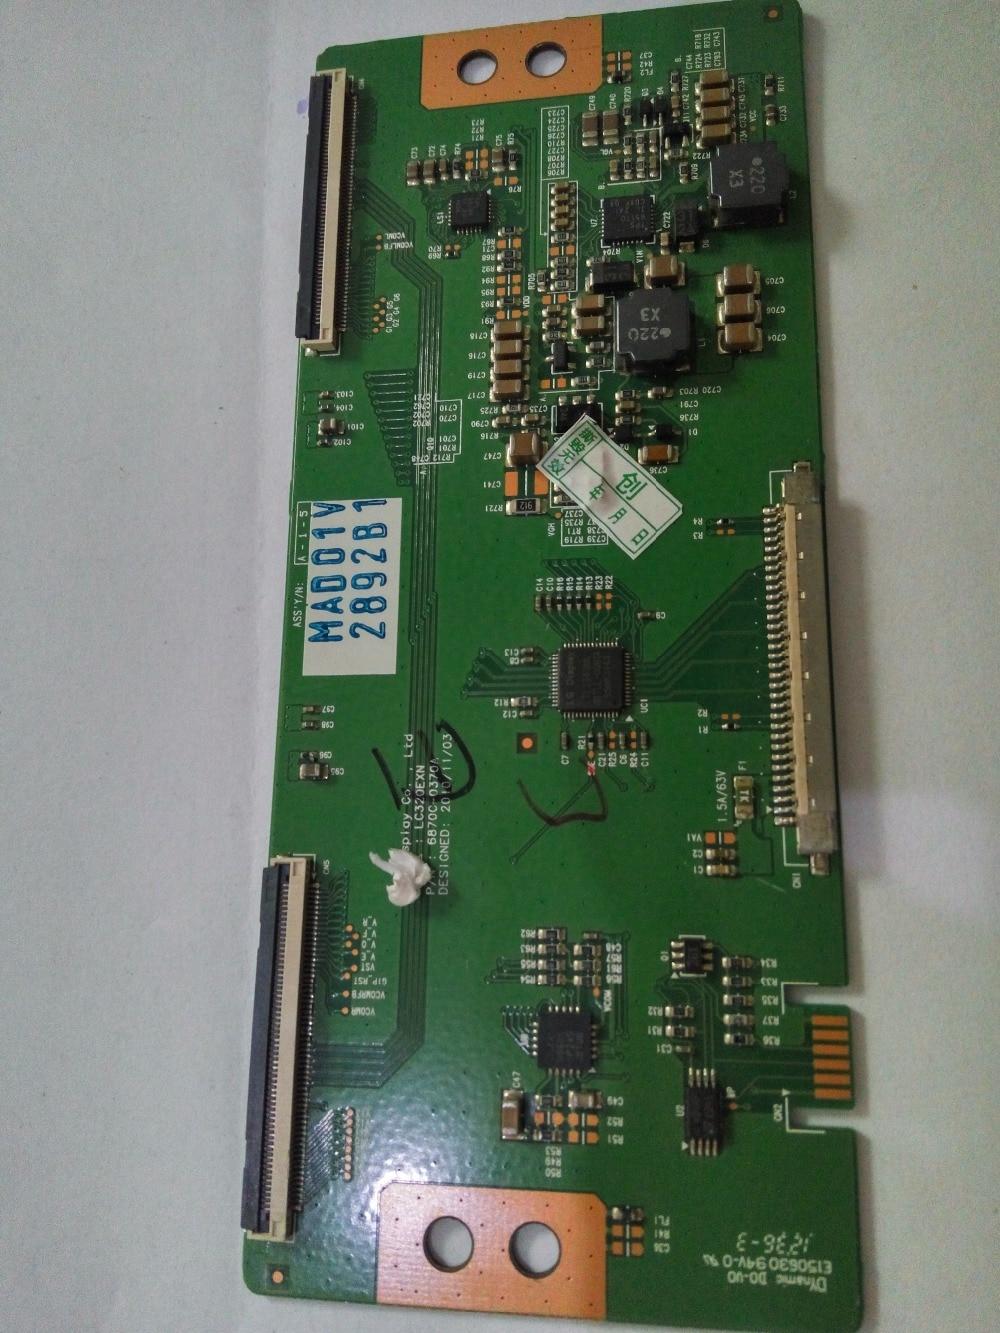 Lc320exn-sea1-k31 Logic Board 6870c-0370a Connect With T-CON Connect Board